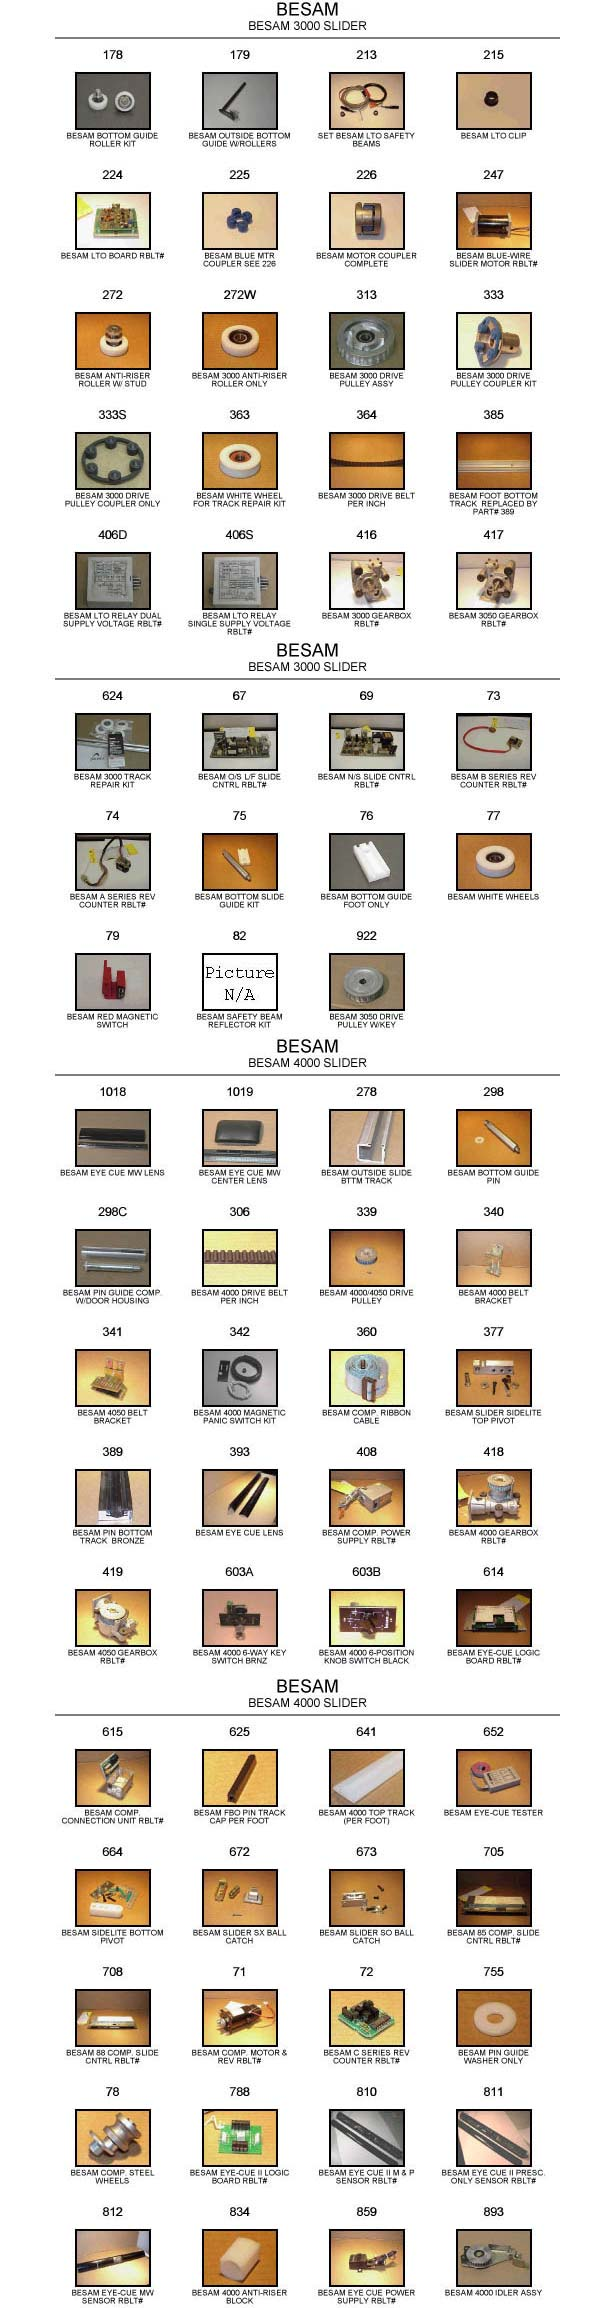 Besam automatic door parts catalog 1